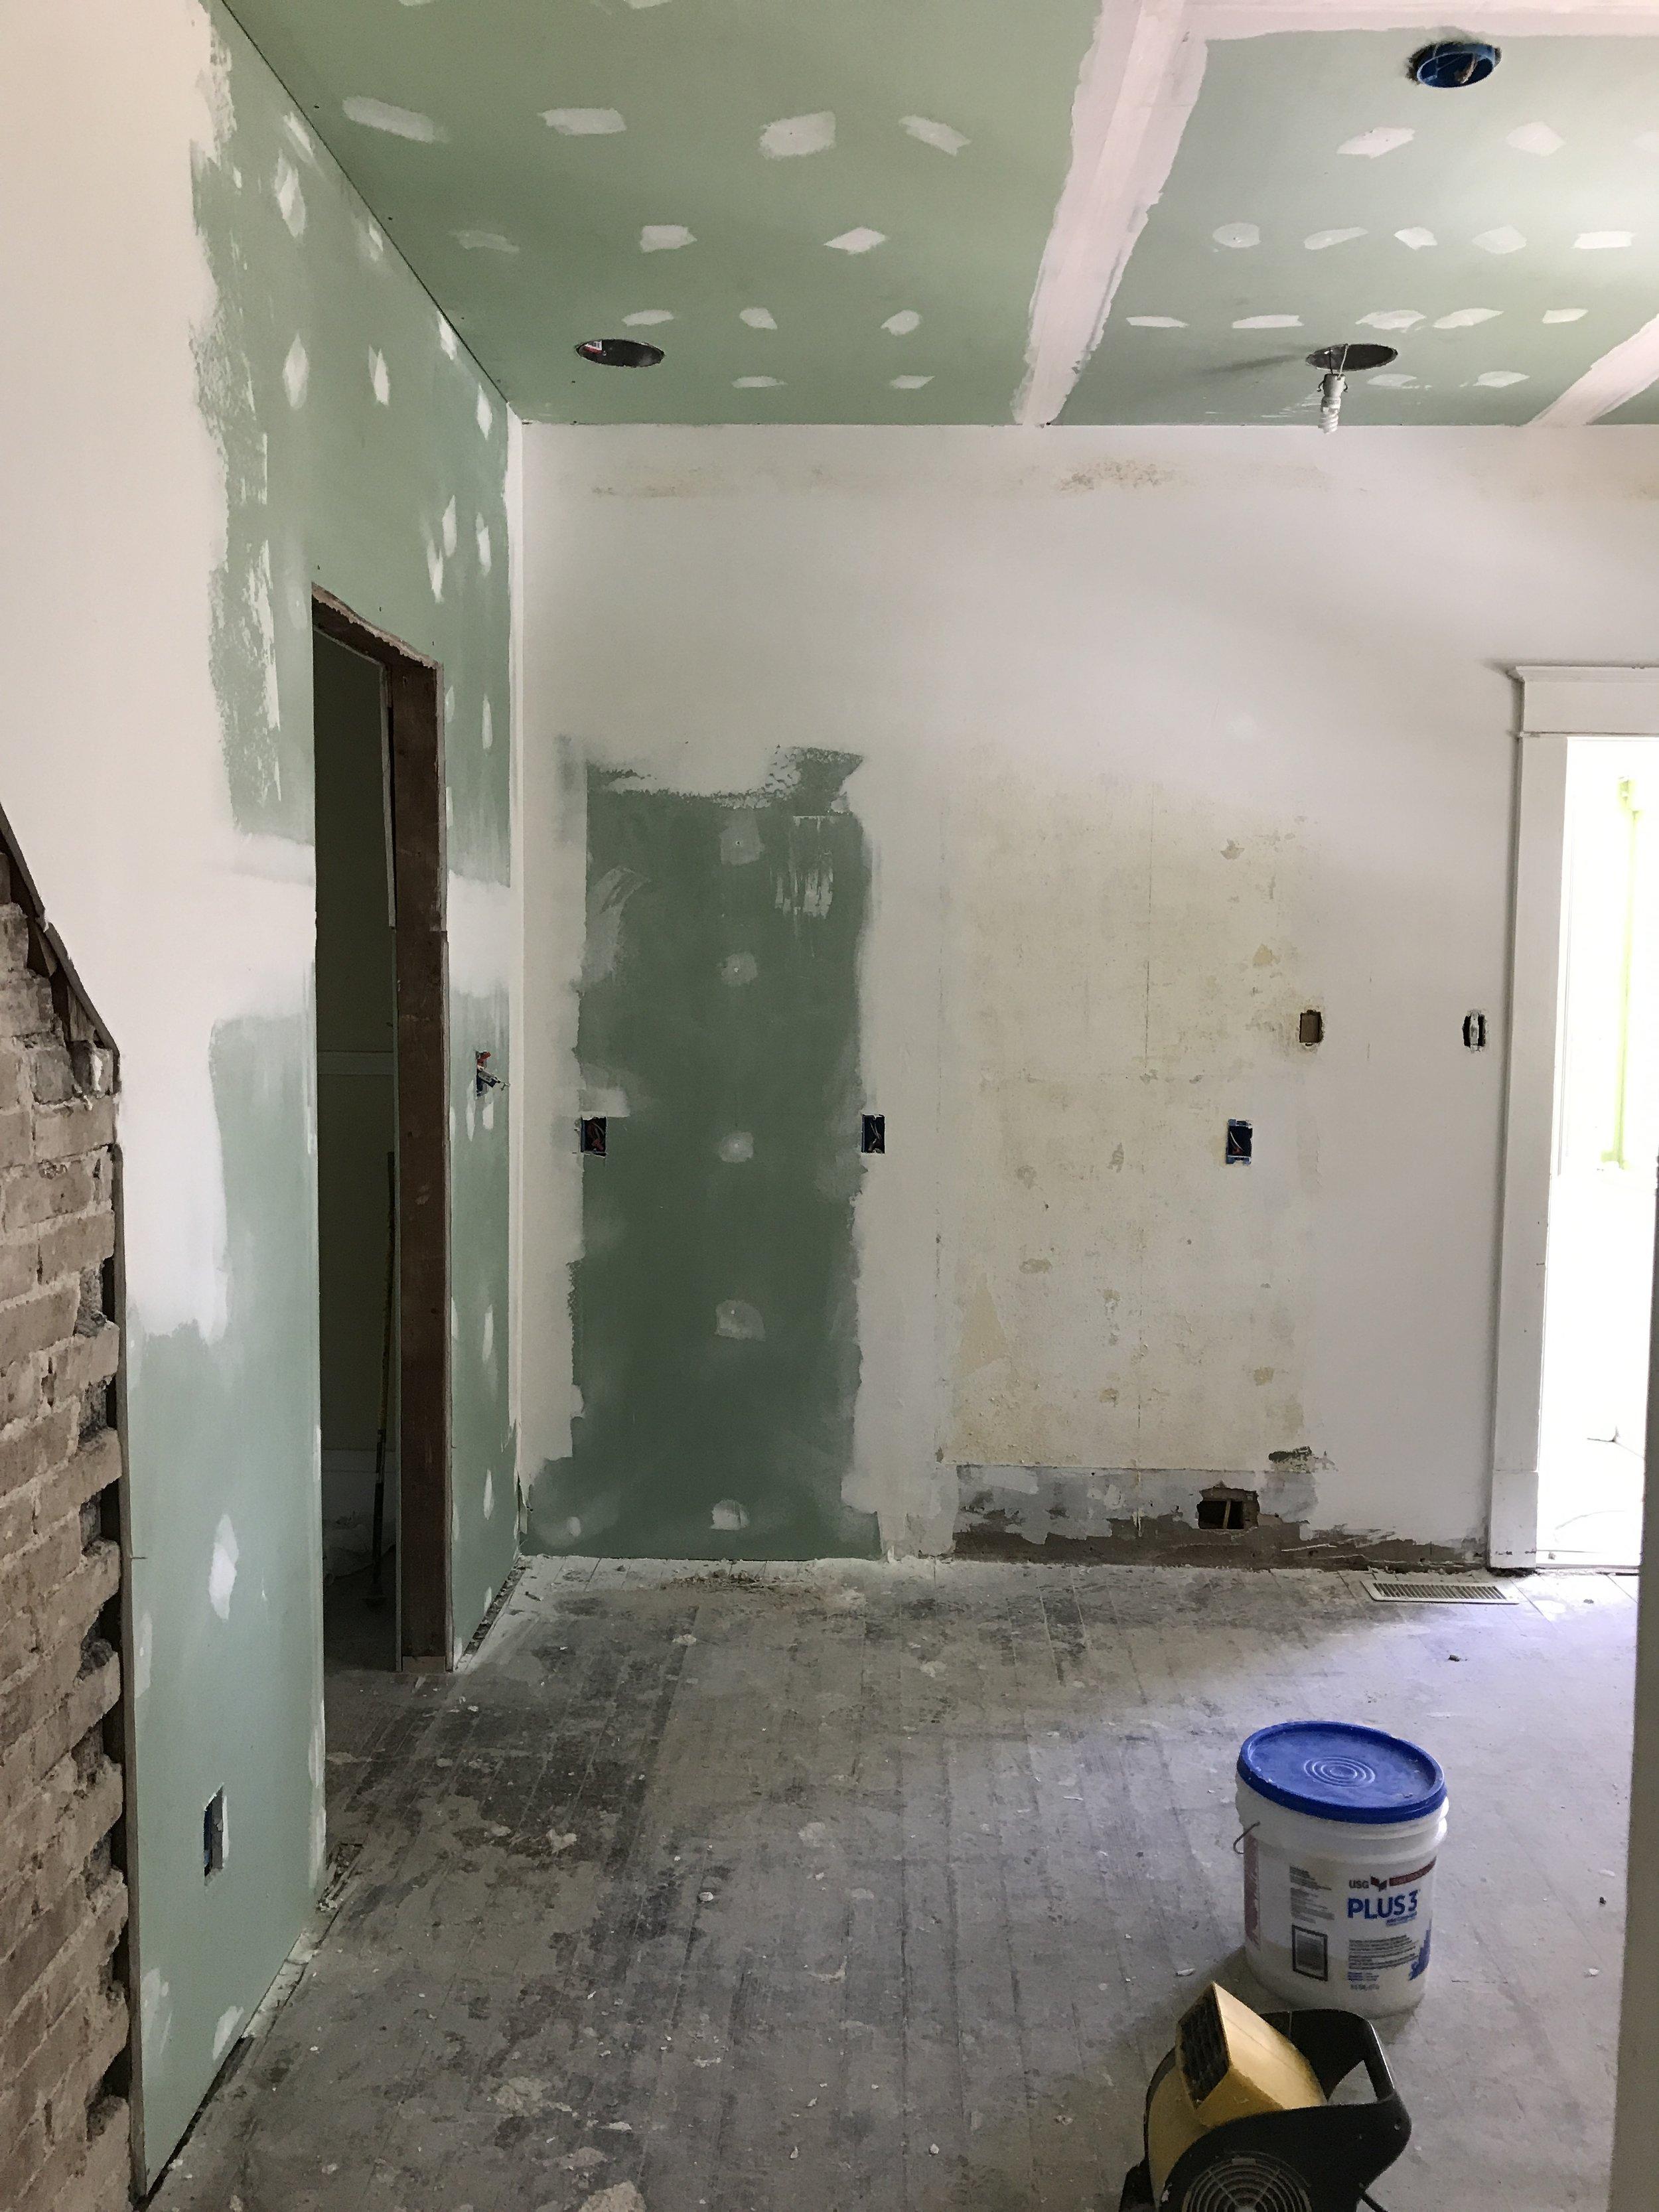 Flip House Update: We're Making Progress